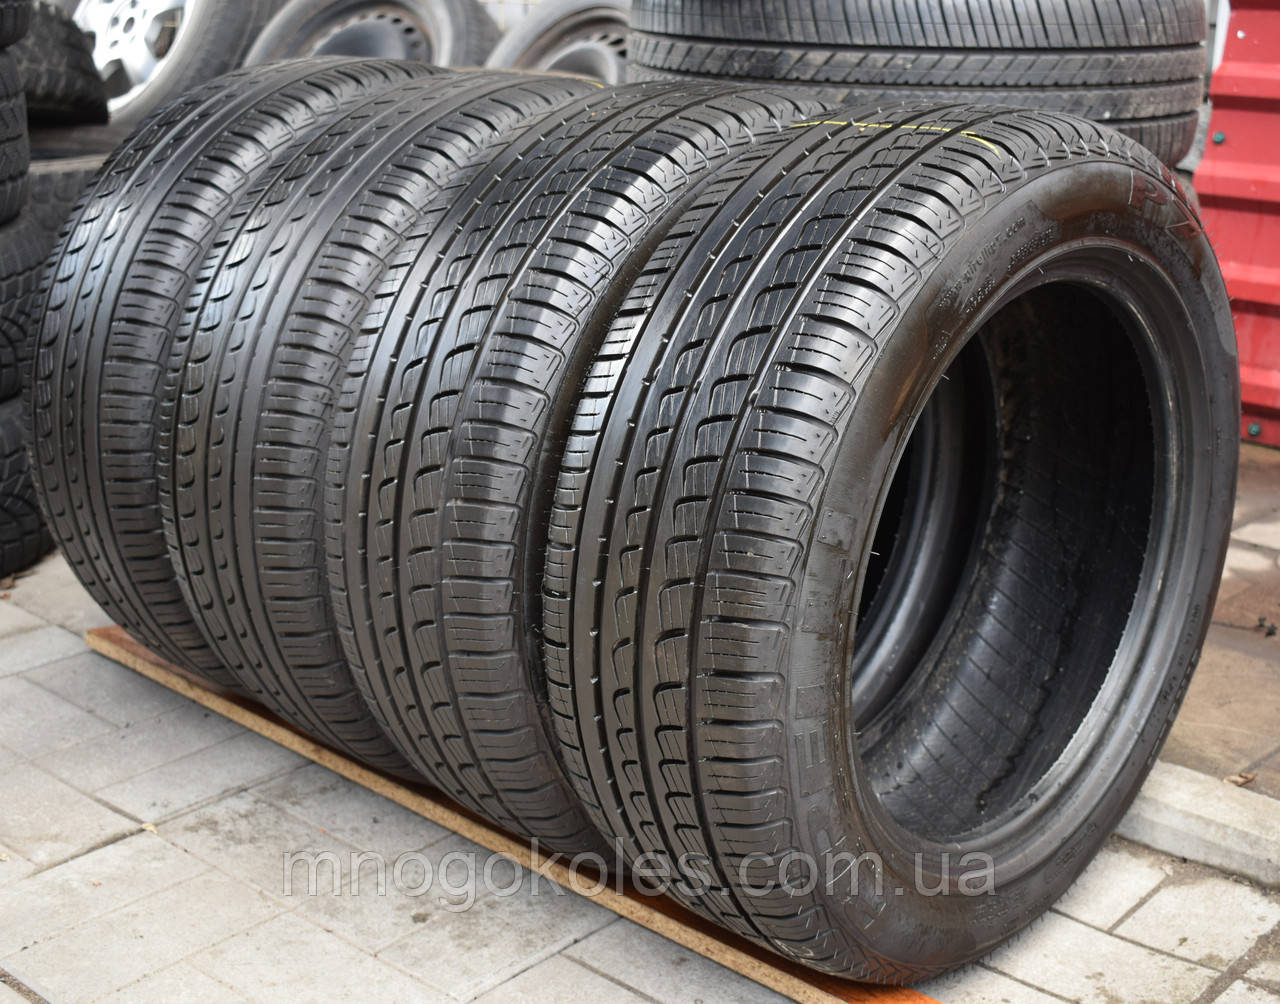 Шины б/у 205/55 R16 Pirelli P7, ЛЕТО, 6 мм, 2016 г., комплект